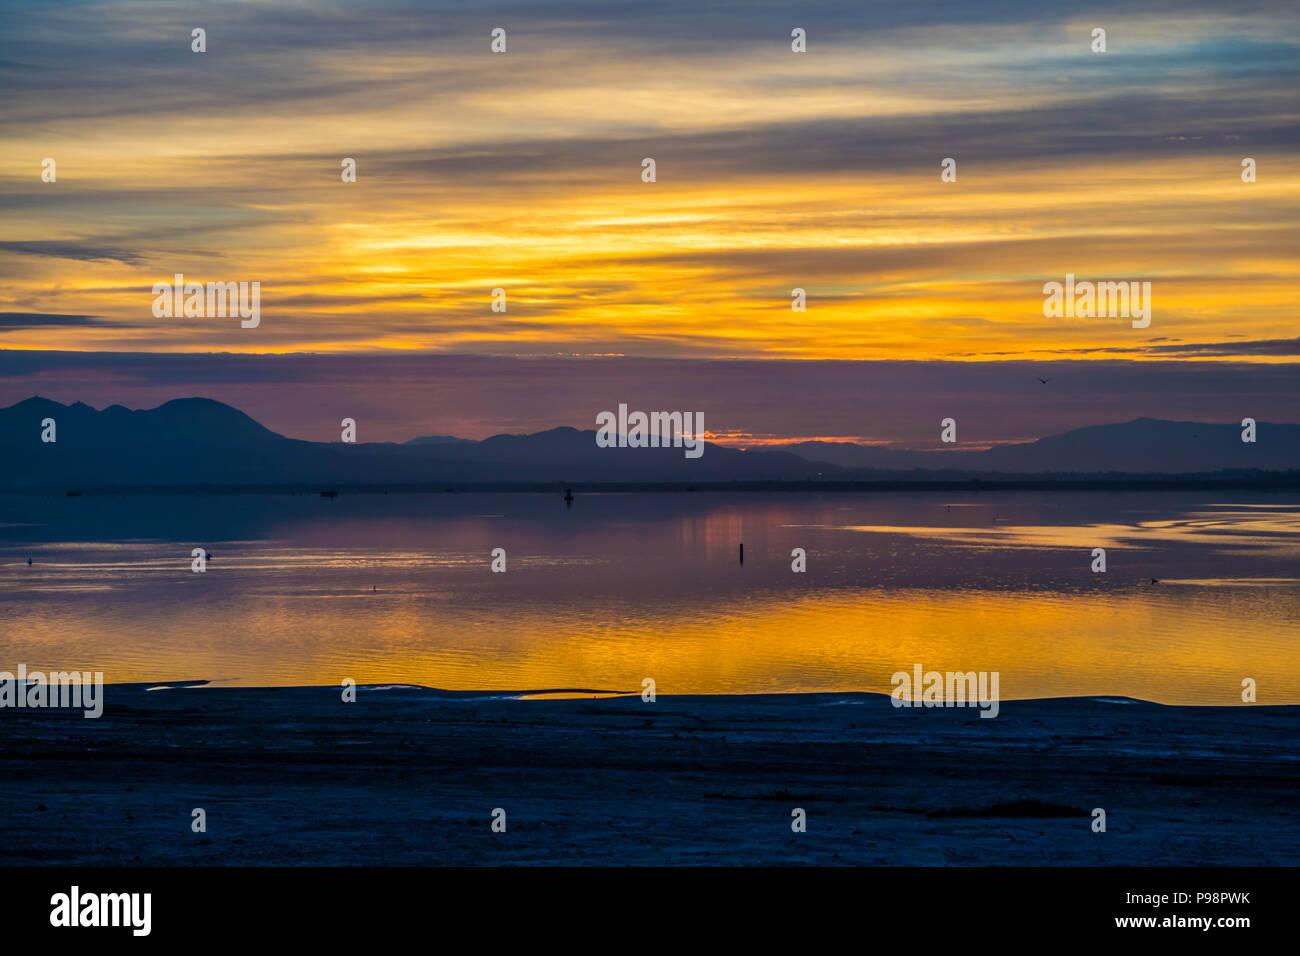 Dramatic vibrant sunset scenery in Lake Elsinore, California - Stock Image